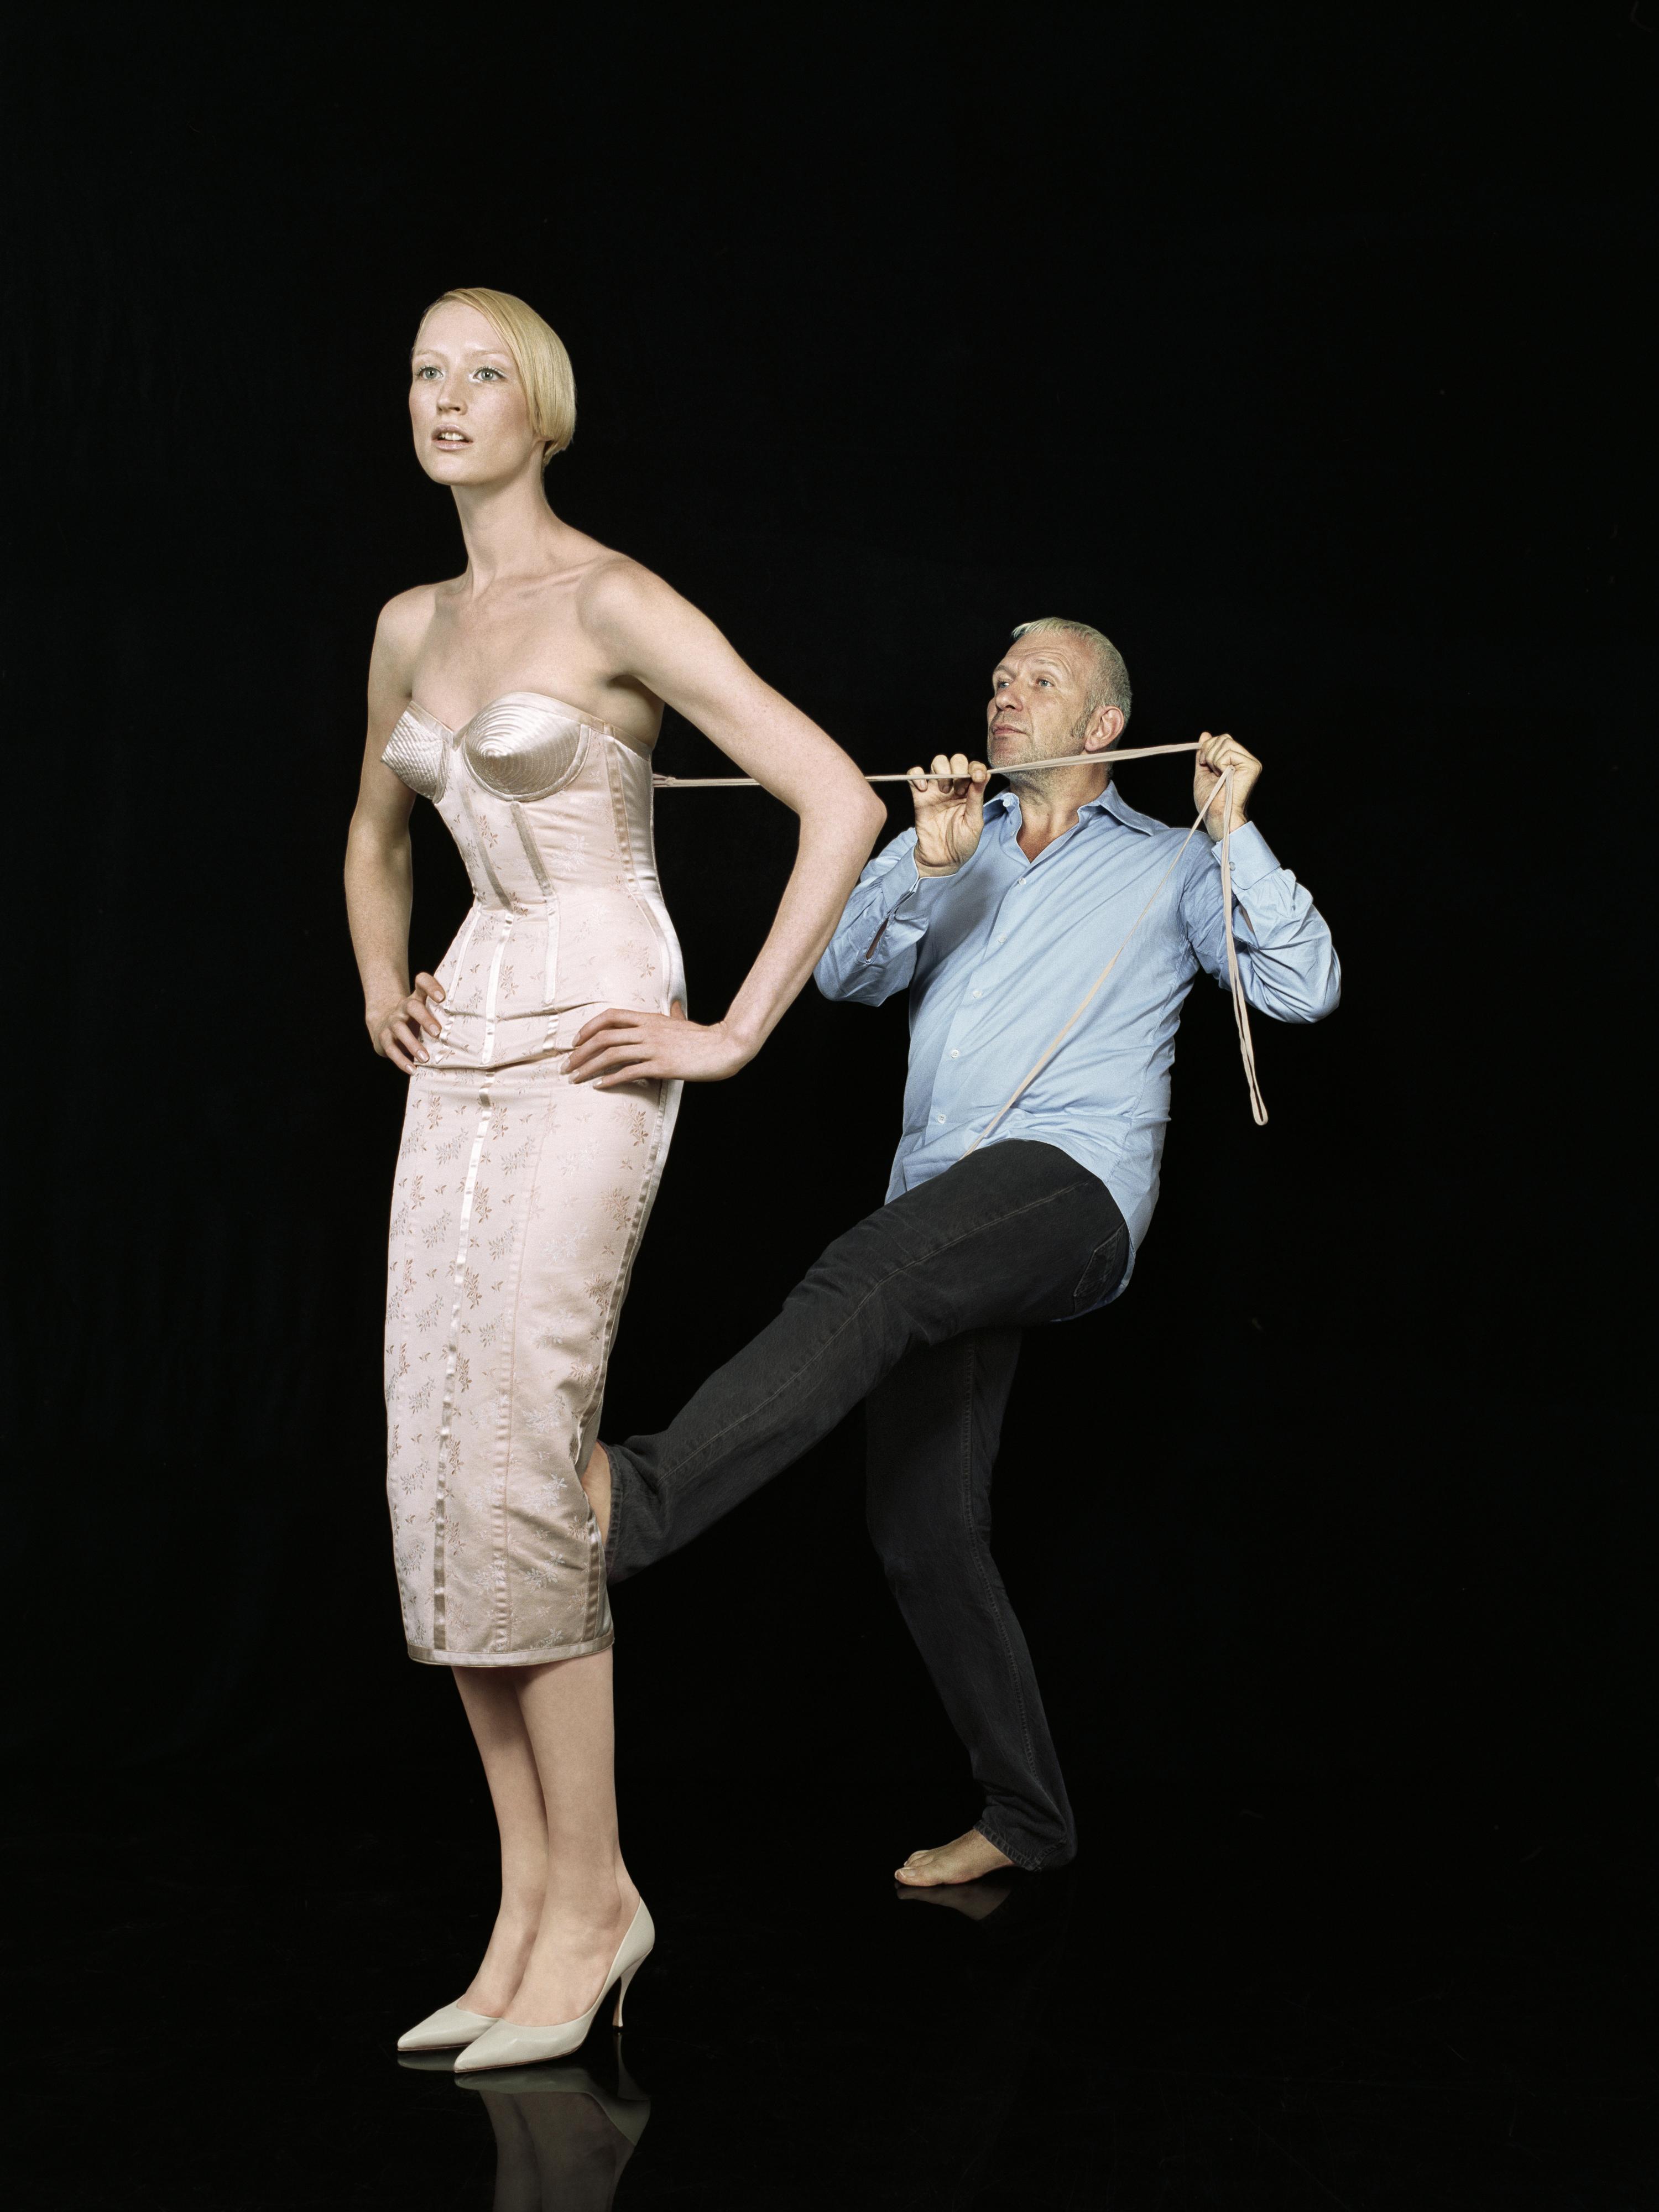 Jean-Paul Gaultier © Roberto Frankenberg. Courtesy agence Modds, Paris